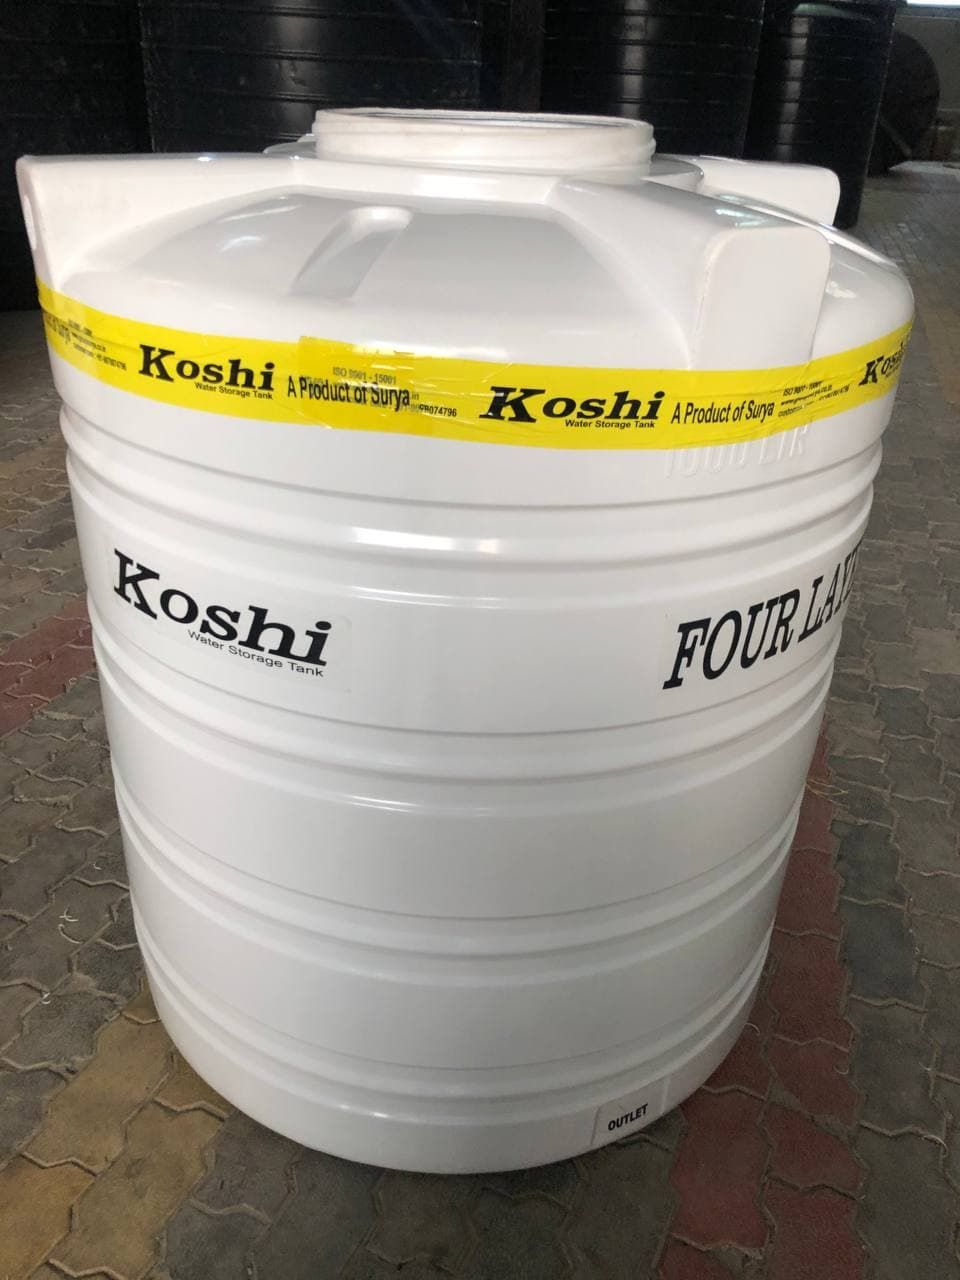 Koshiplast water storage tanks manufacturer (500 ltr)